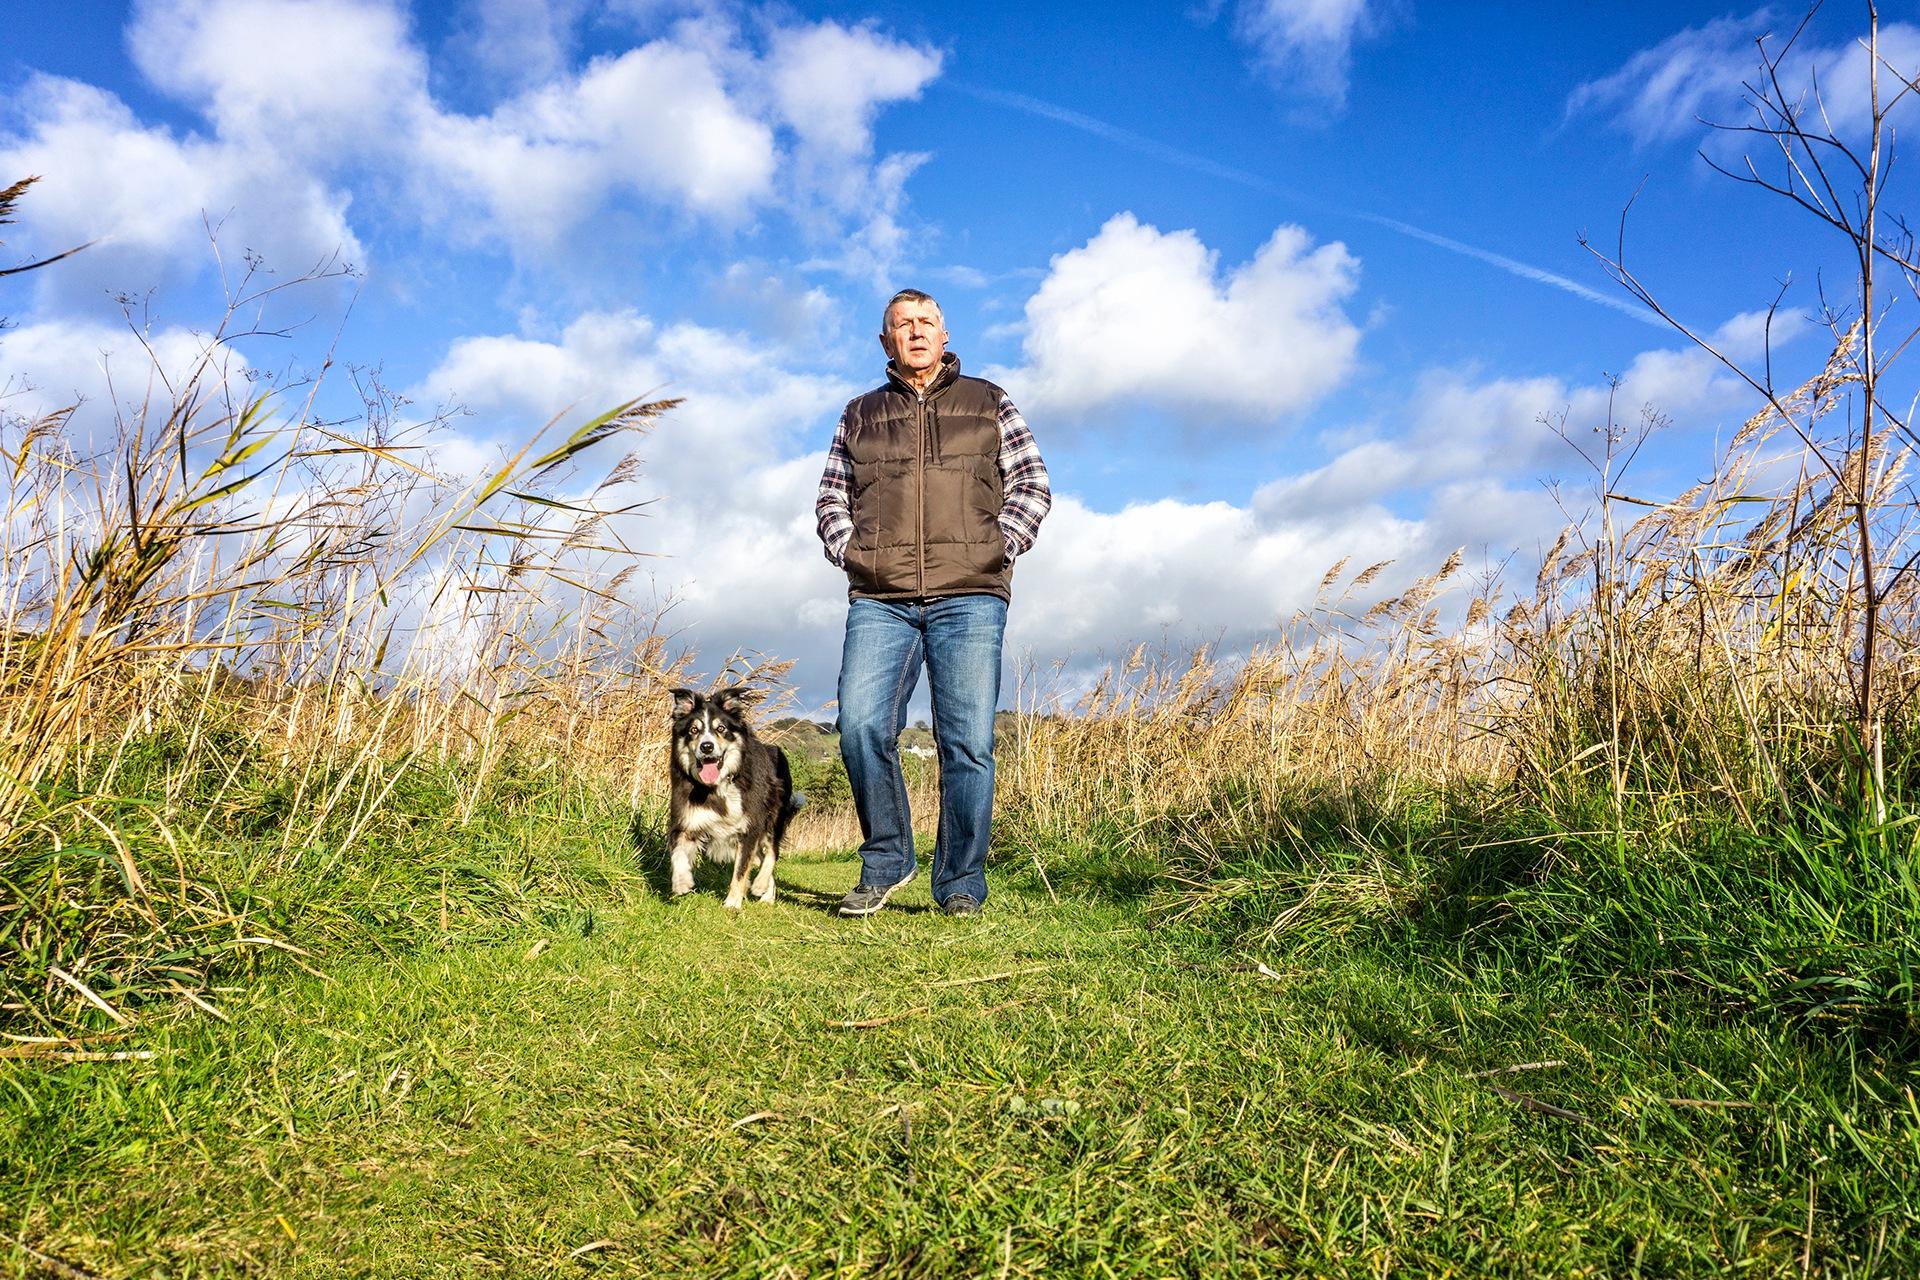 Walking the dog by Gary Martin